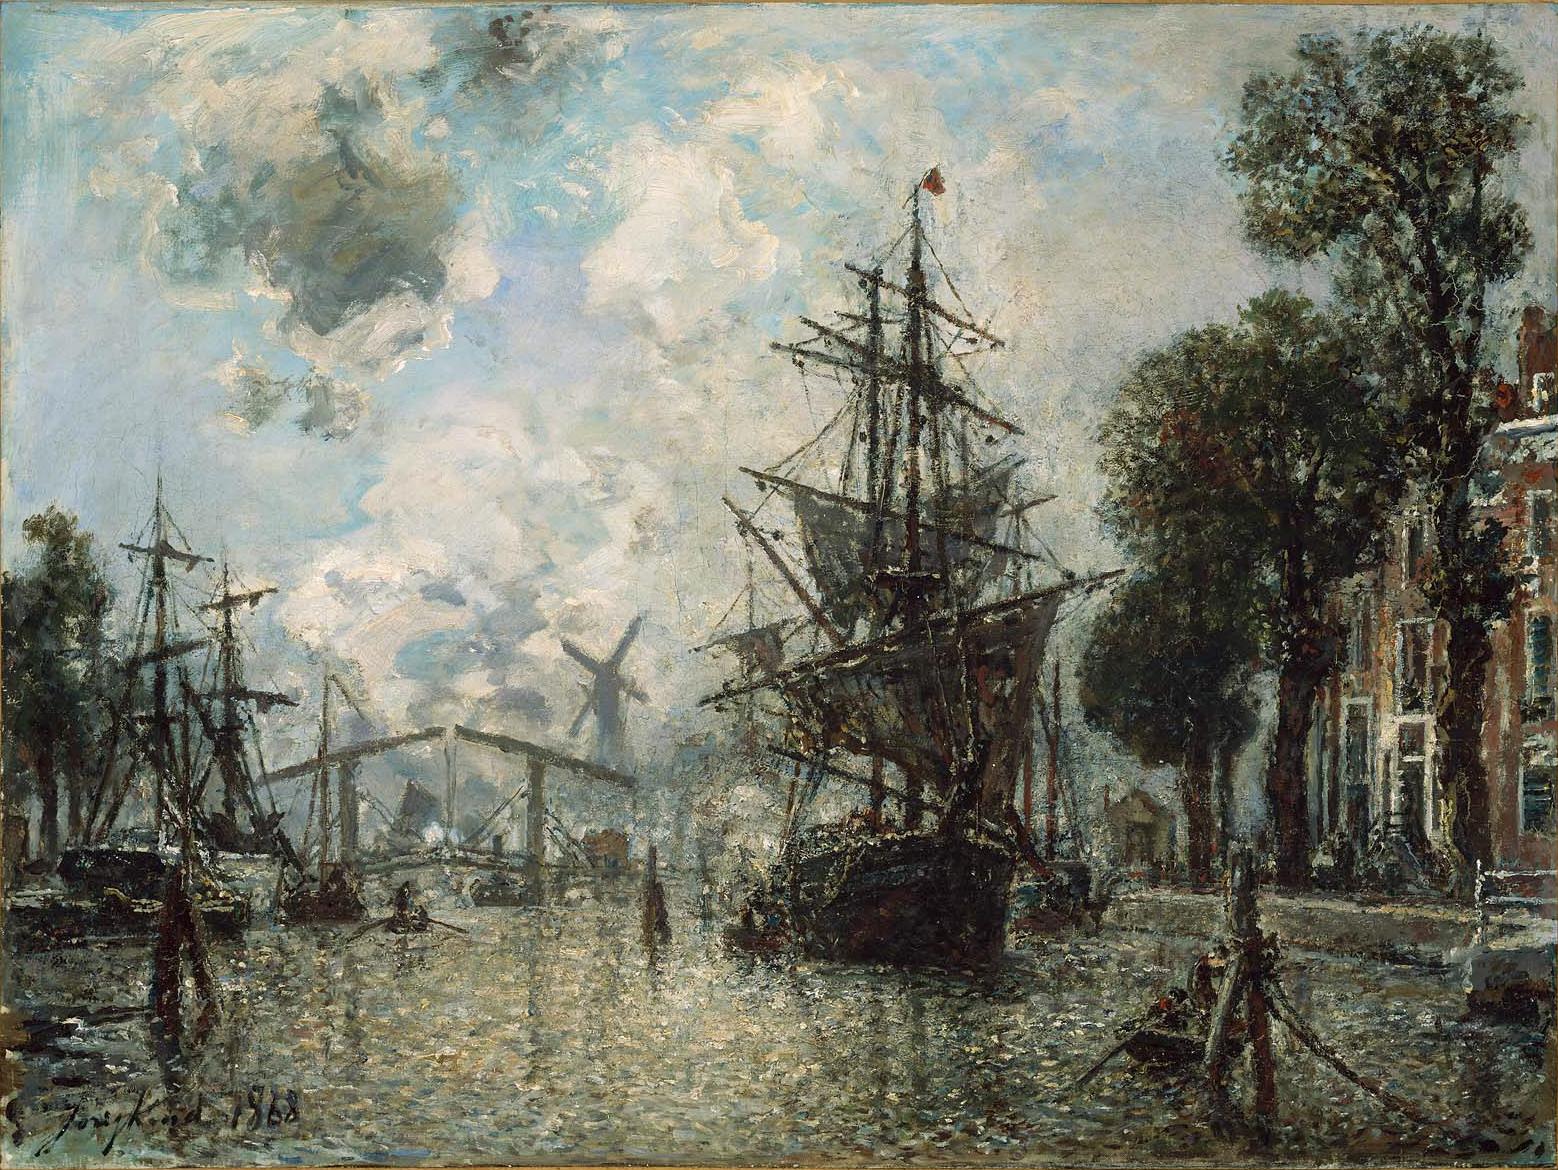 Ян Йохан Йонгкинд Johan Barthold Jongkind художник картины пейзажи природы Альберт Сафиуллин